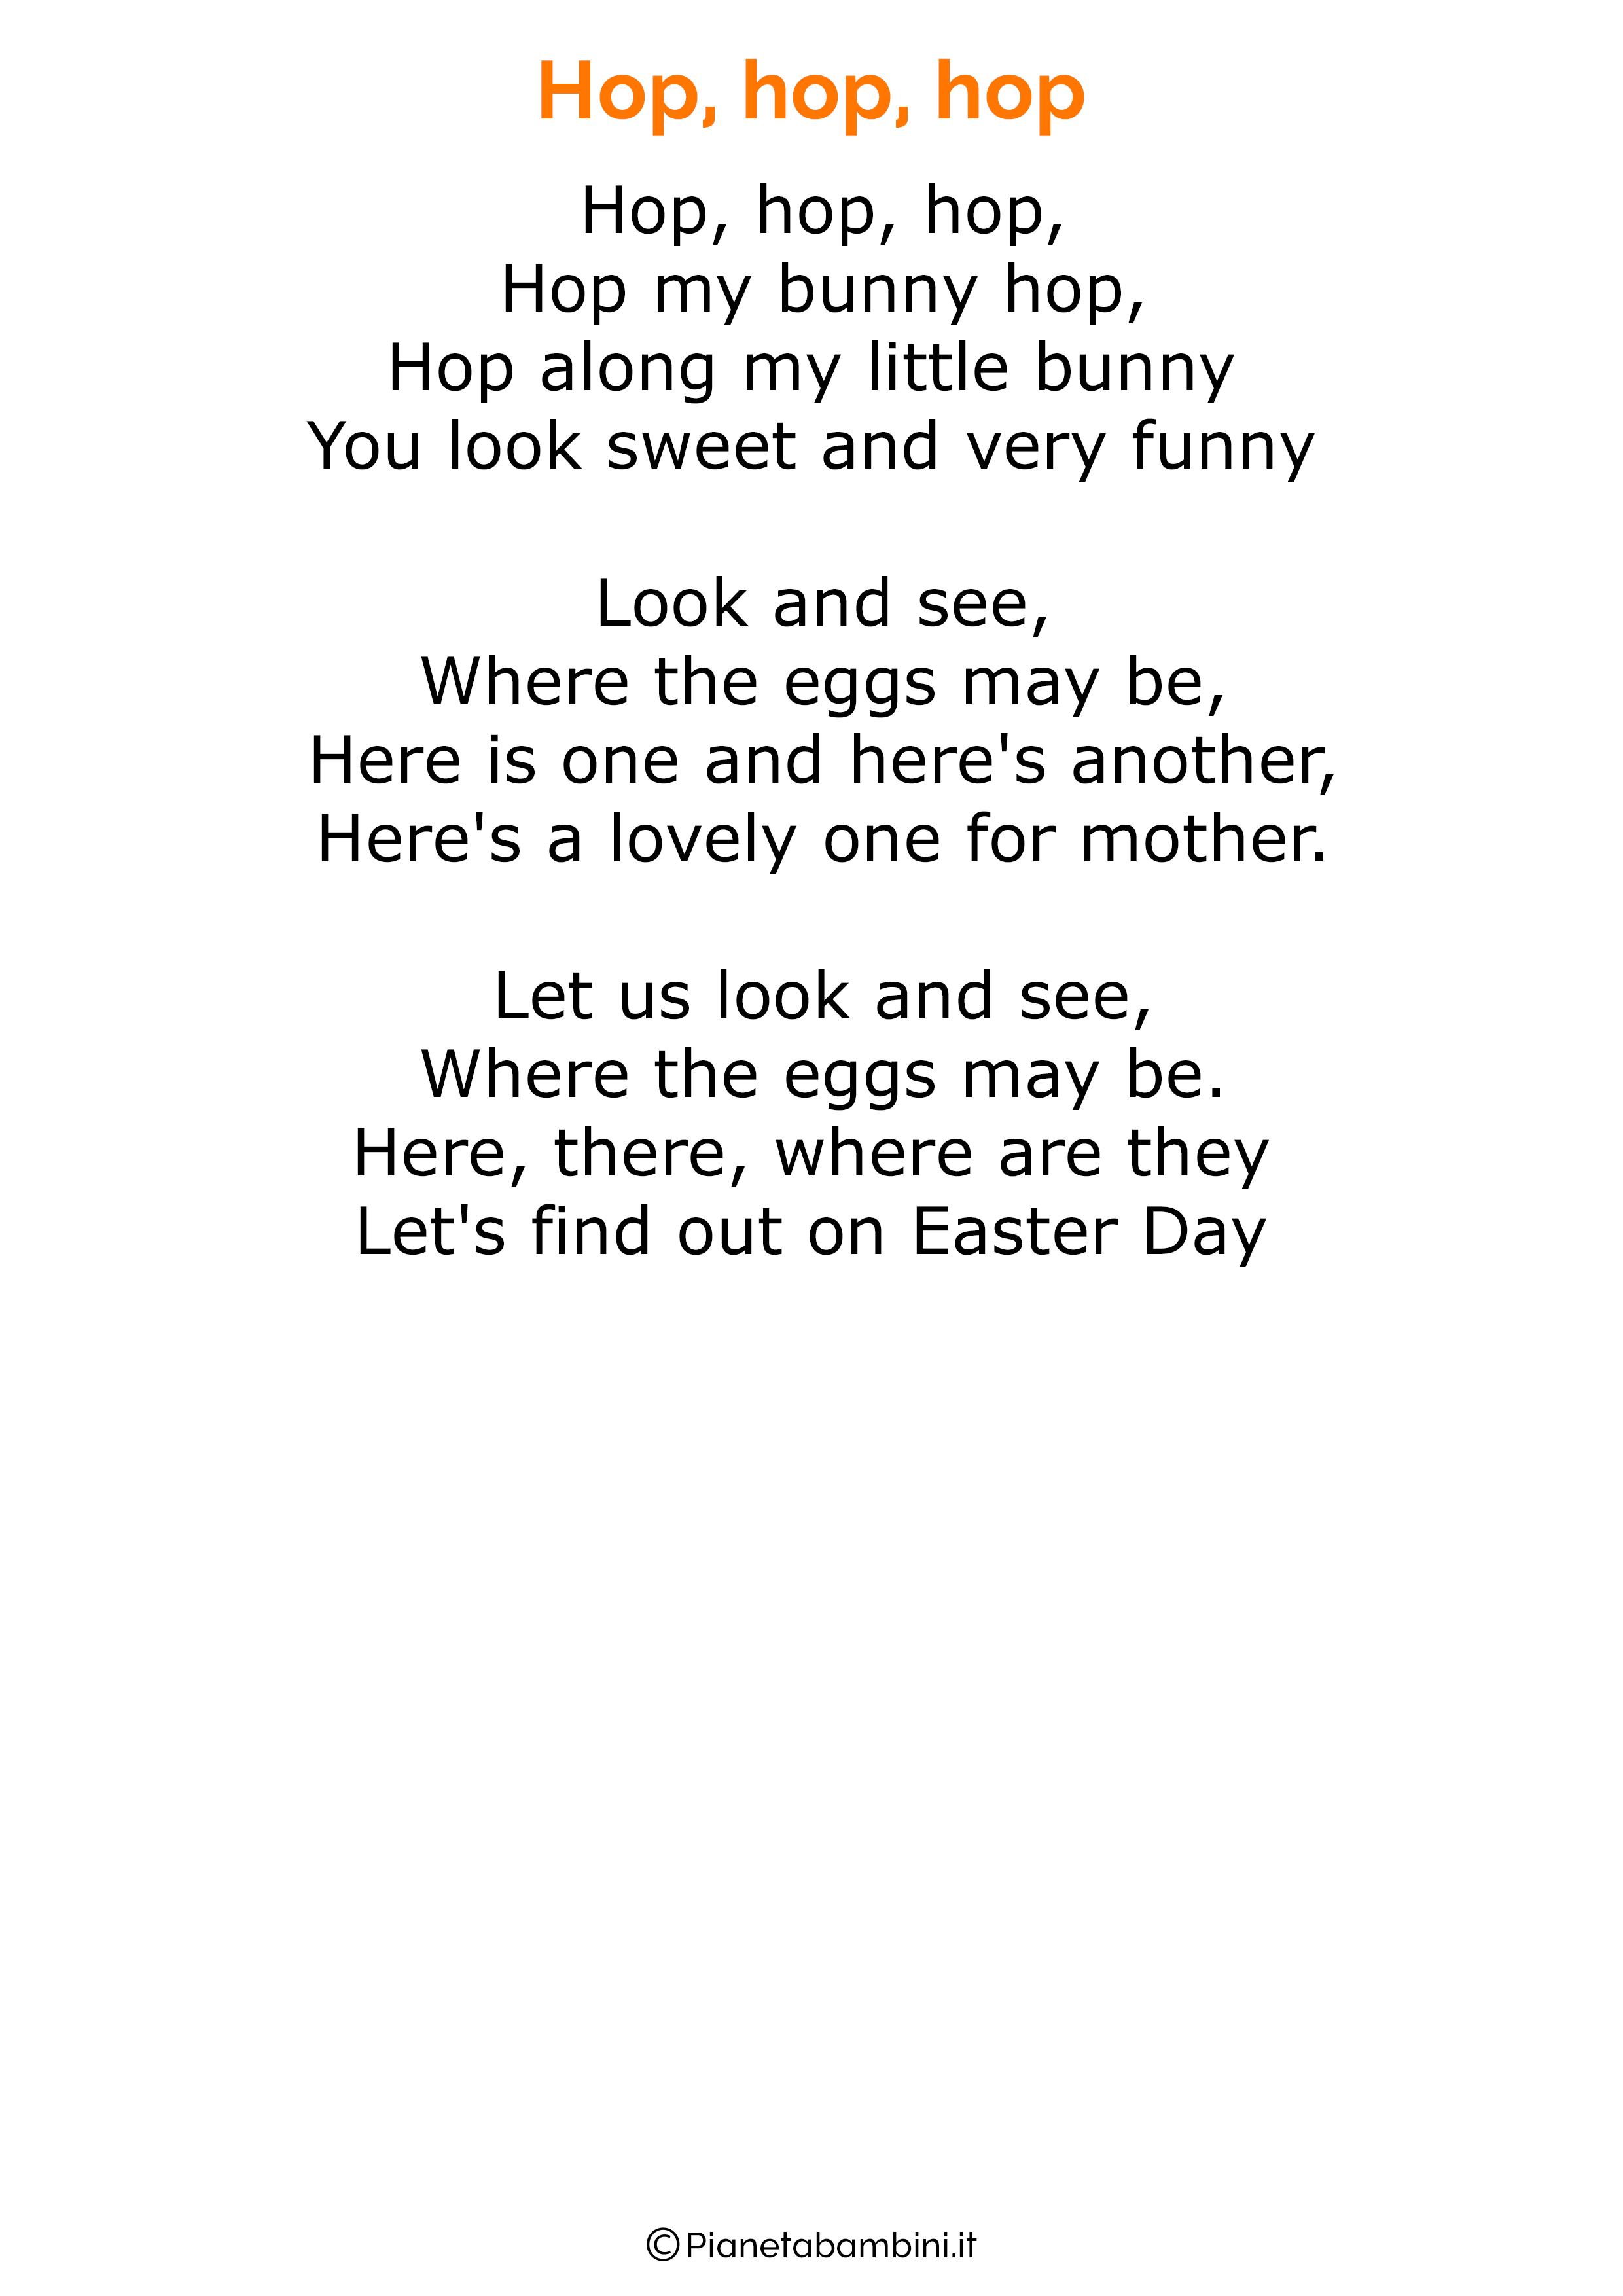 Poesie di Pasqua in inglese per bambini 06